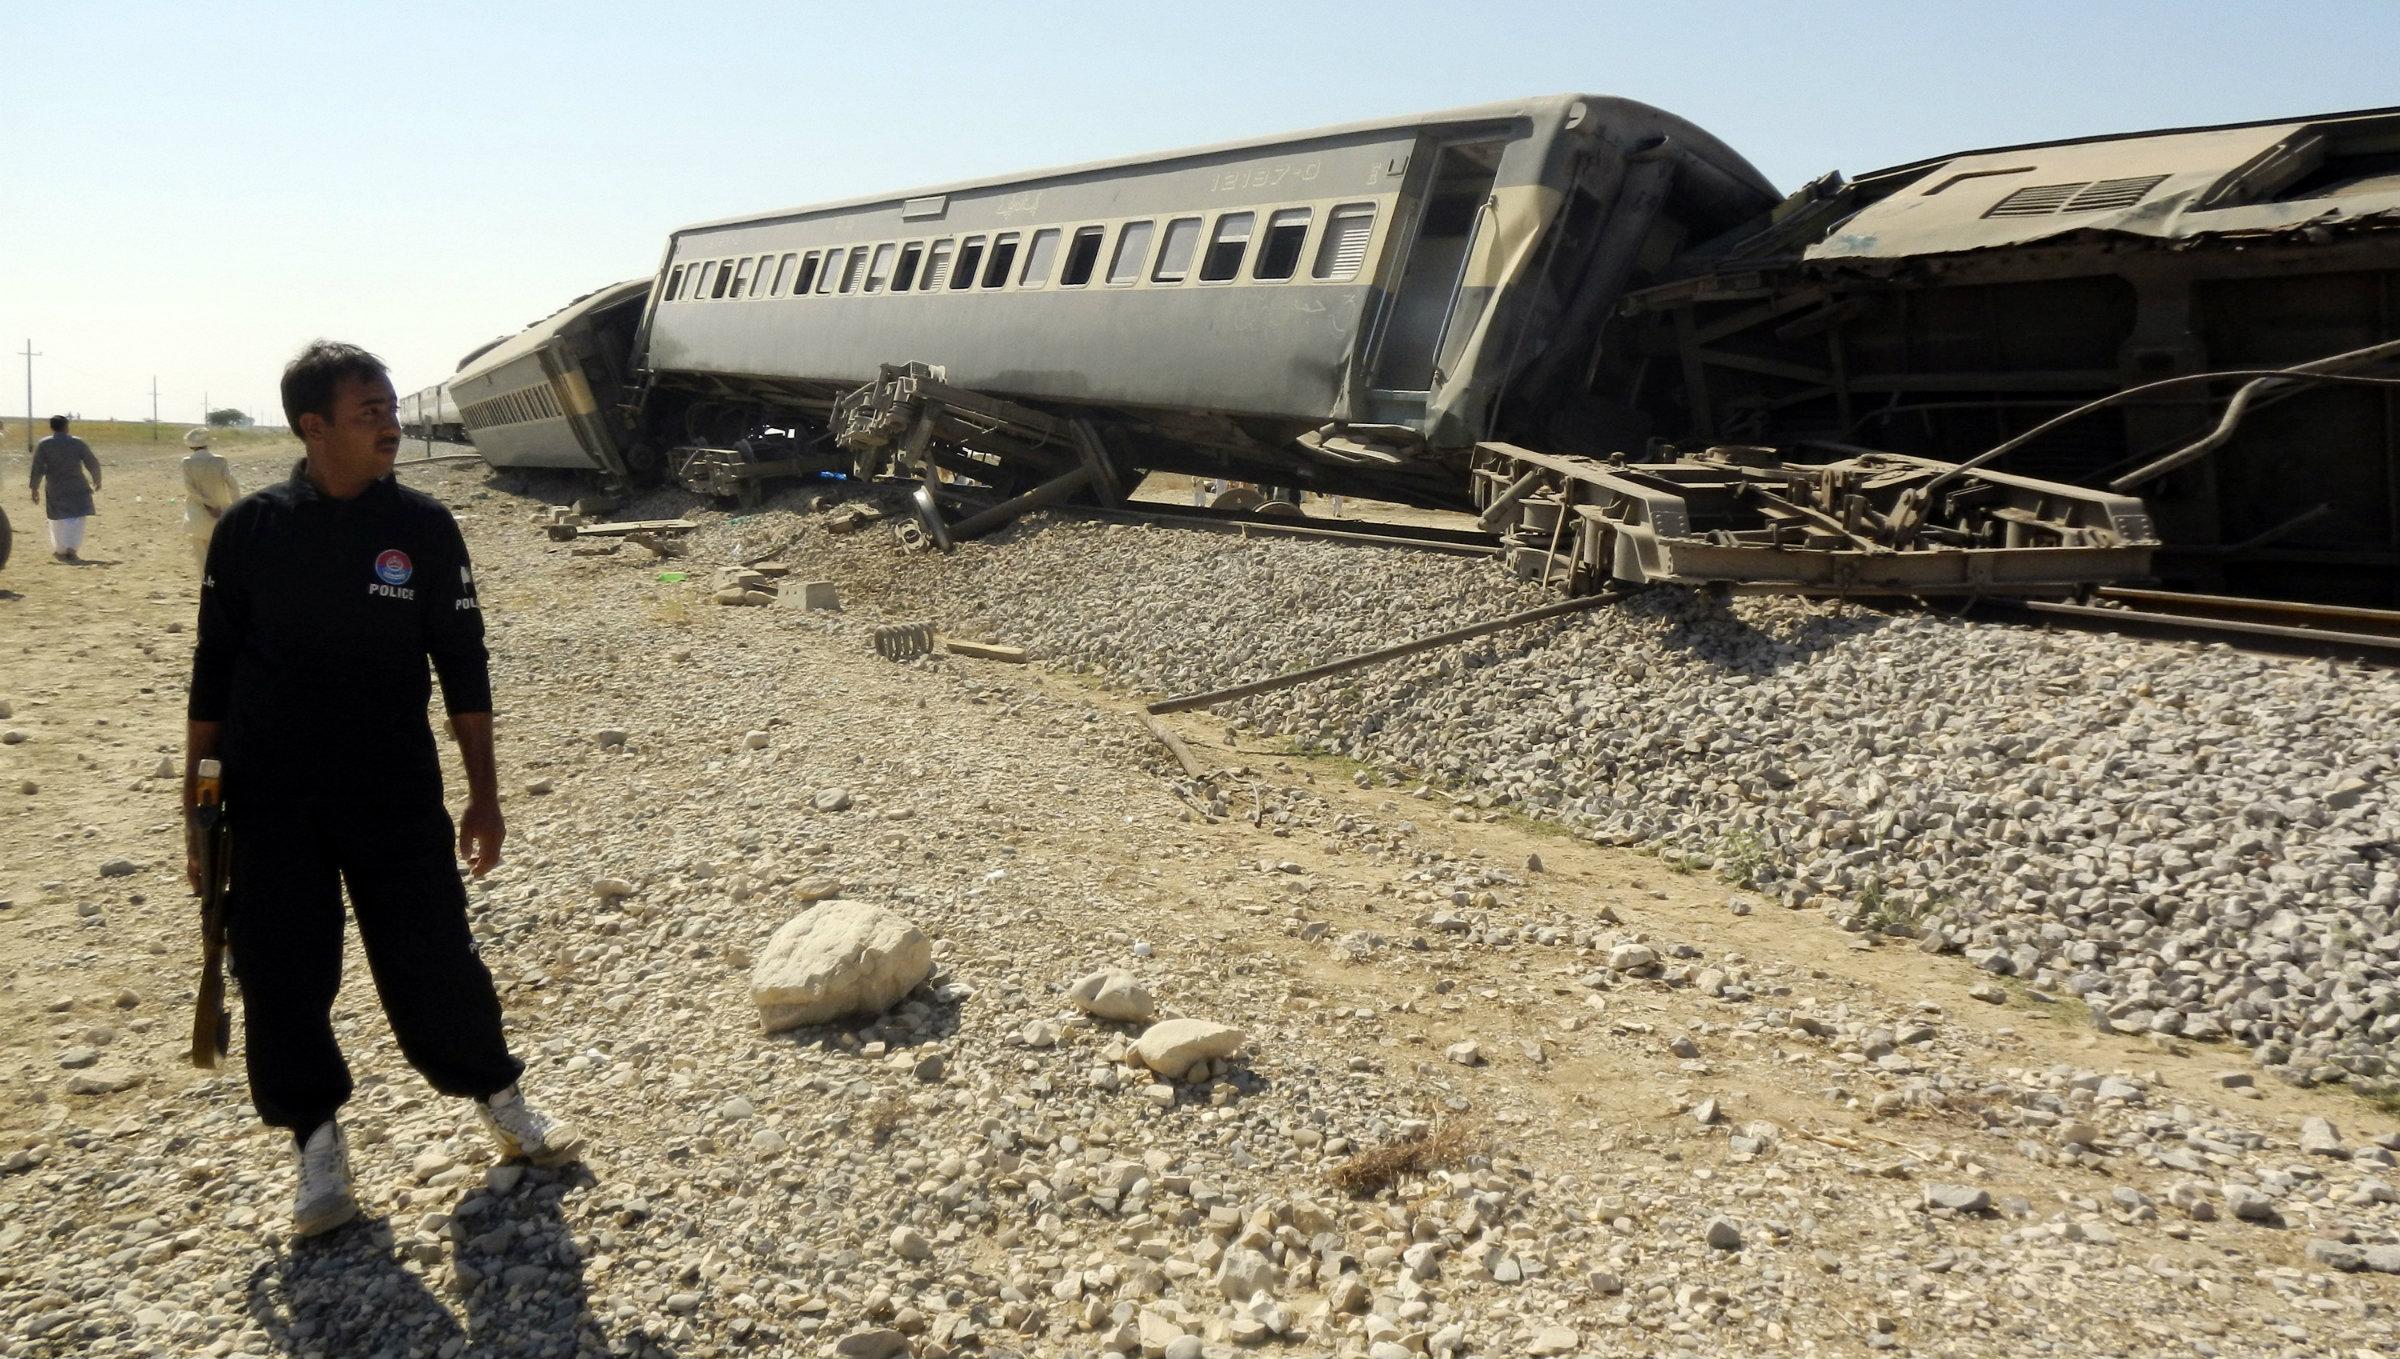 Balochistan passenger train attack 2013